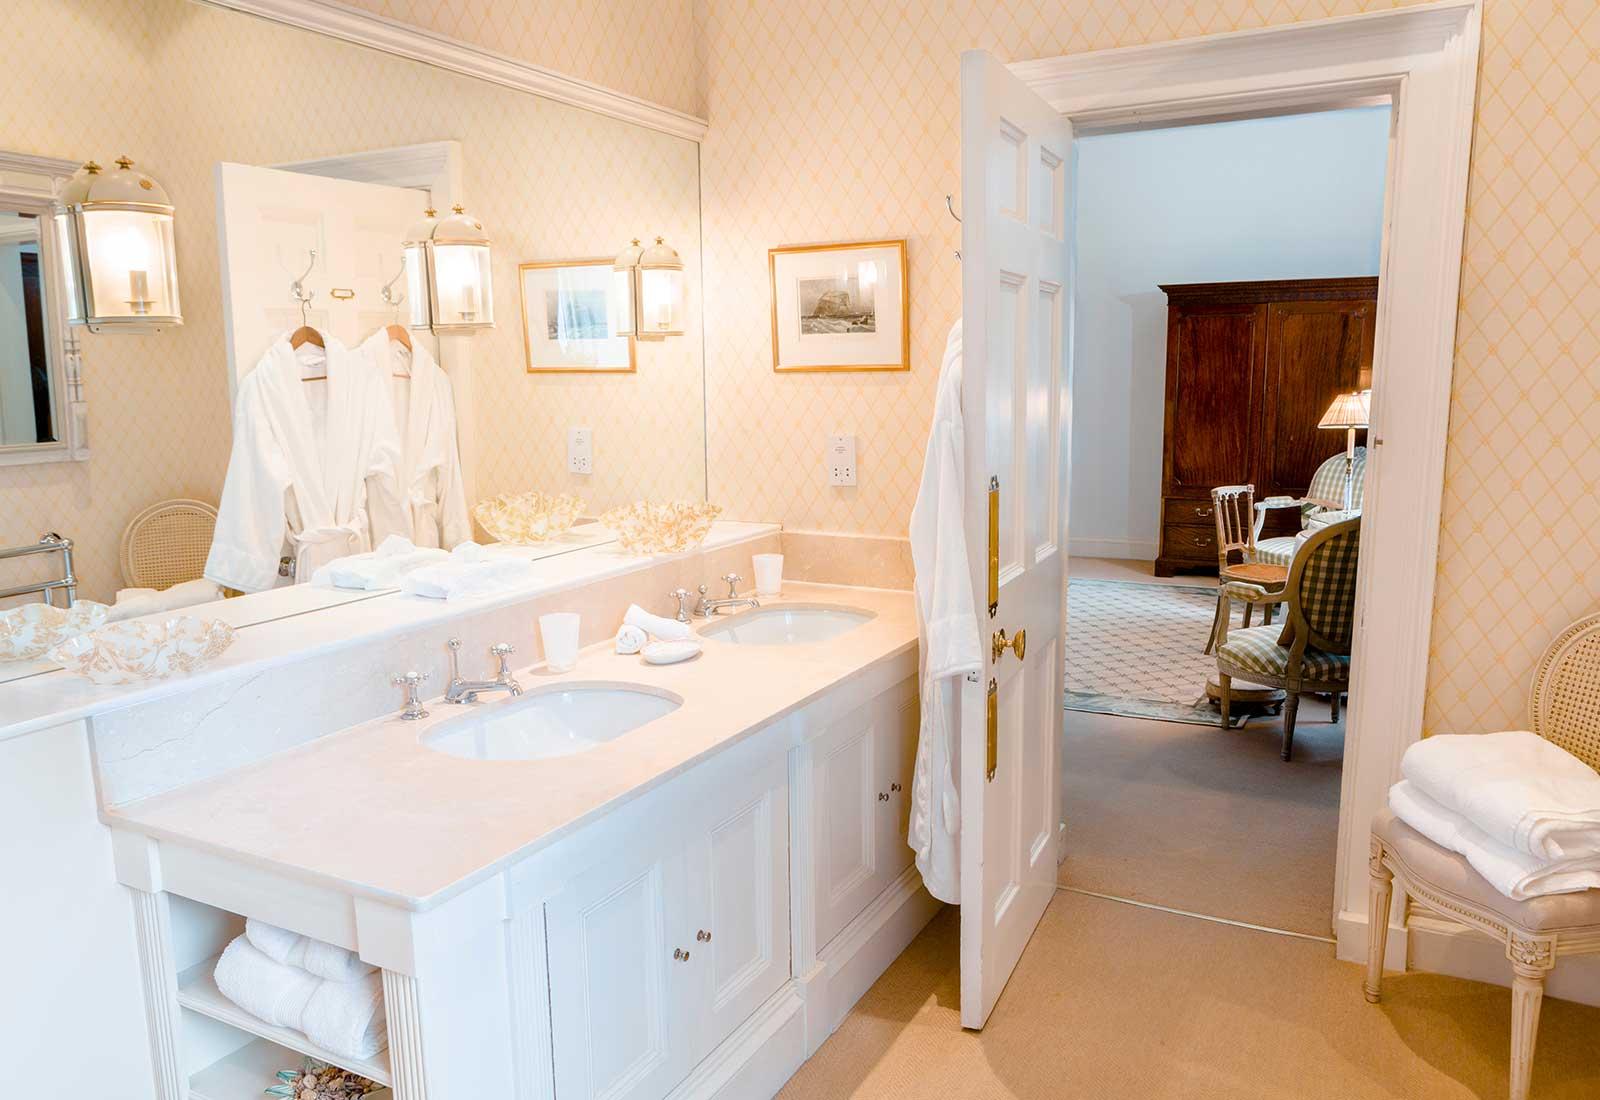 Orchid Bathroom